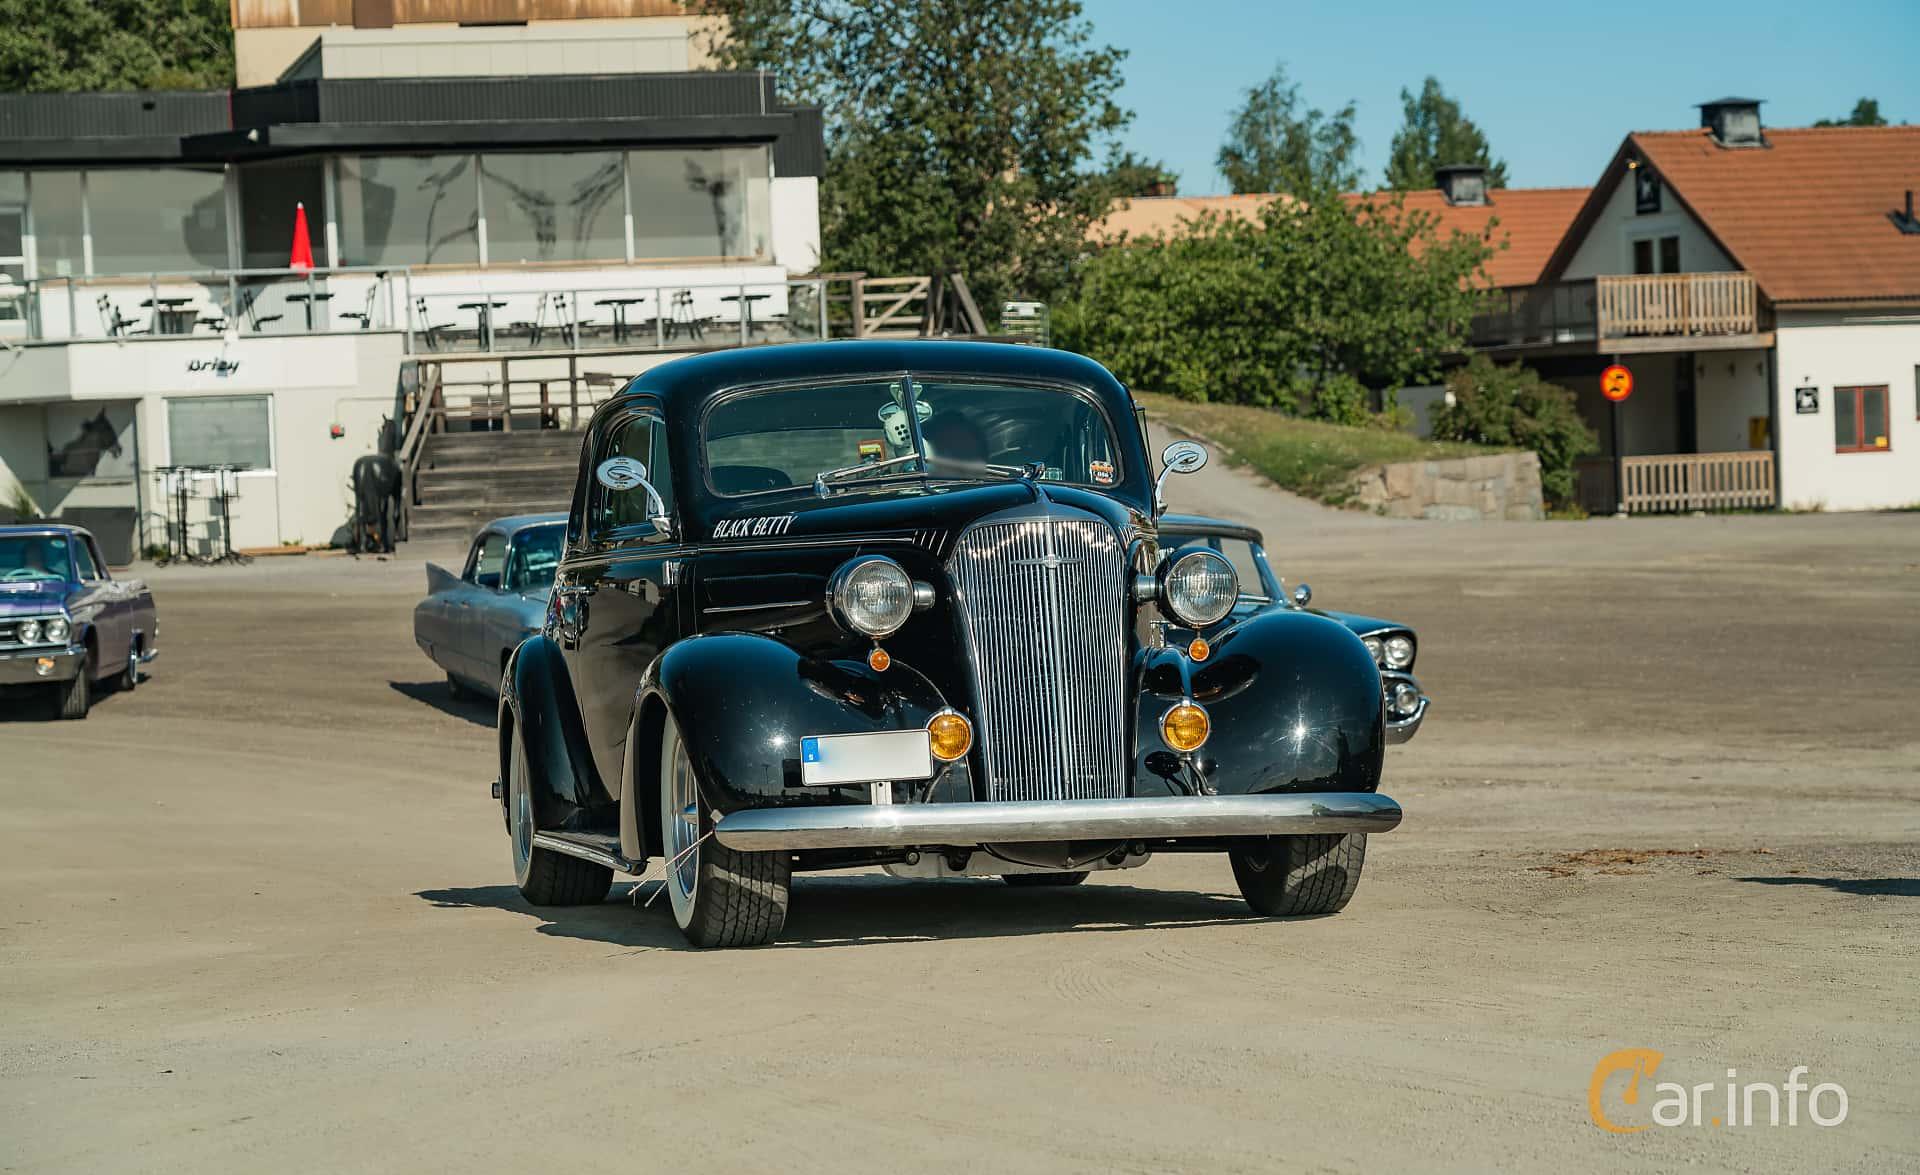 Chevrolet Master Coupé 3.5 Manual, 86hp, 1937 at Stockholm Vintage & Sports Car meet 2019